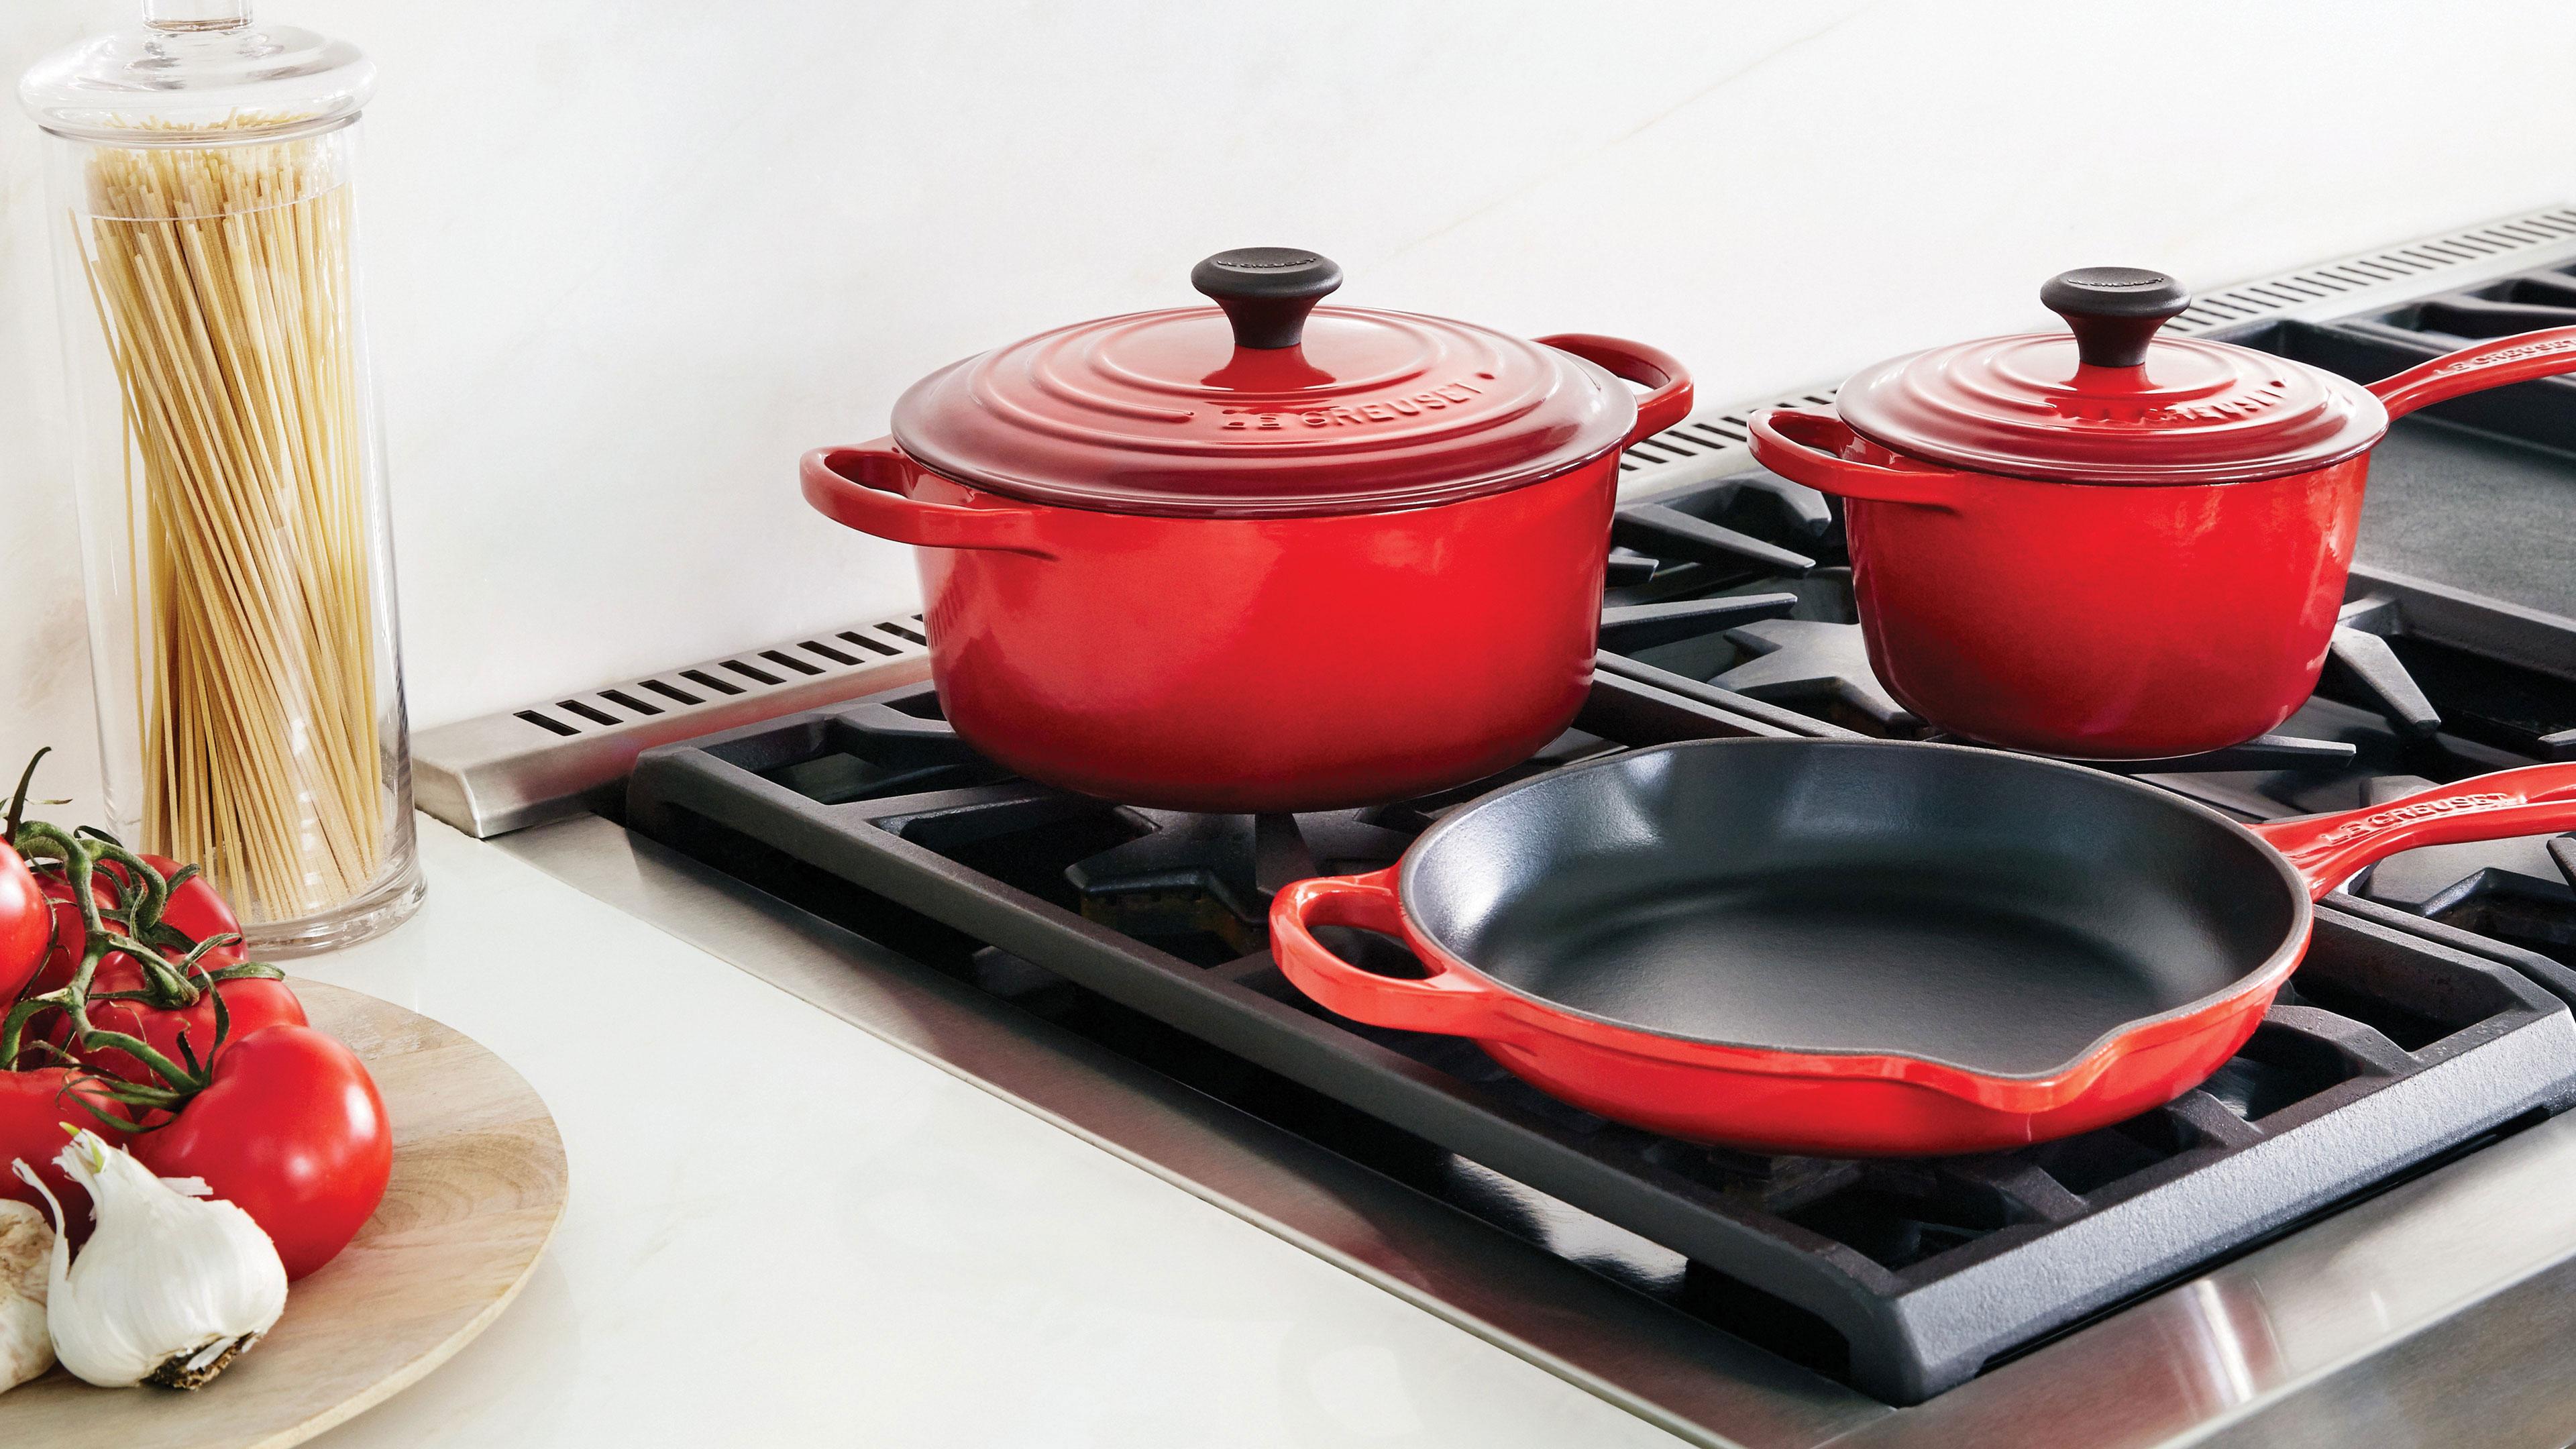 Le Creuset Signature Cast Iron Cookware Set 16 Piece